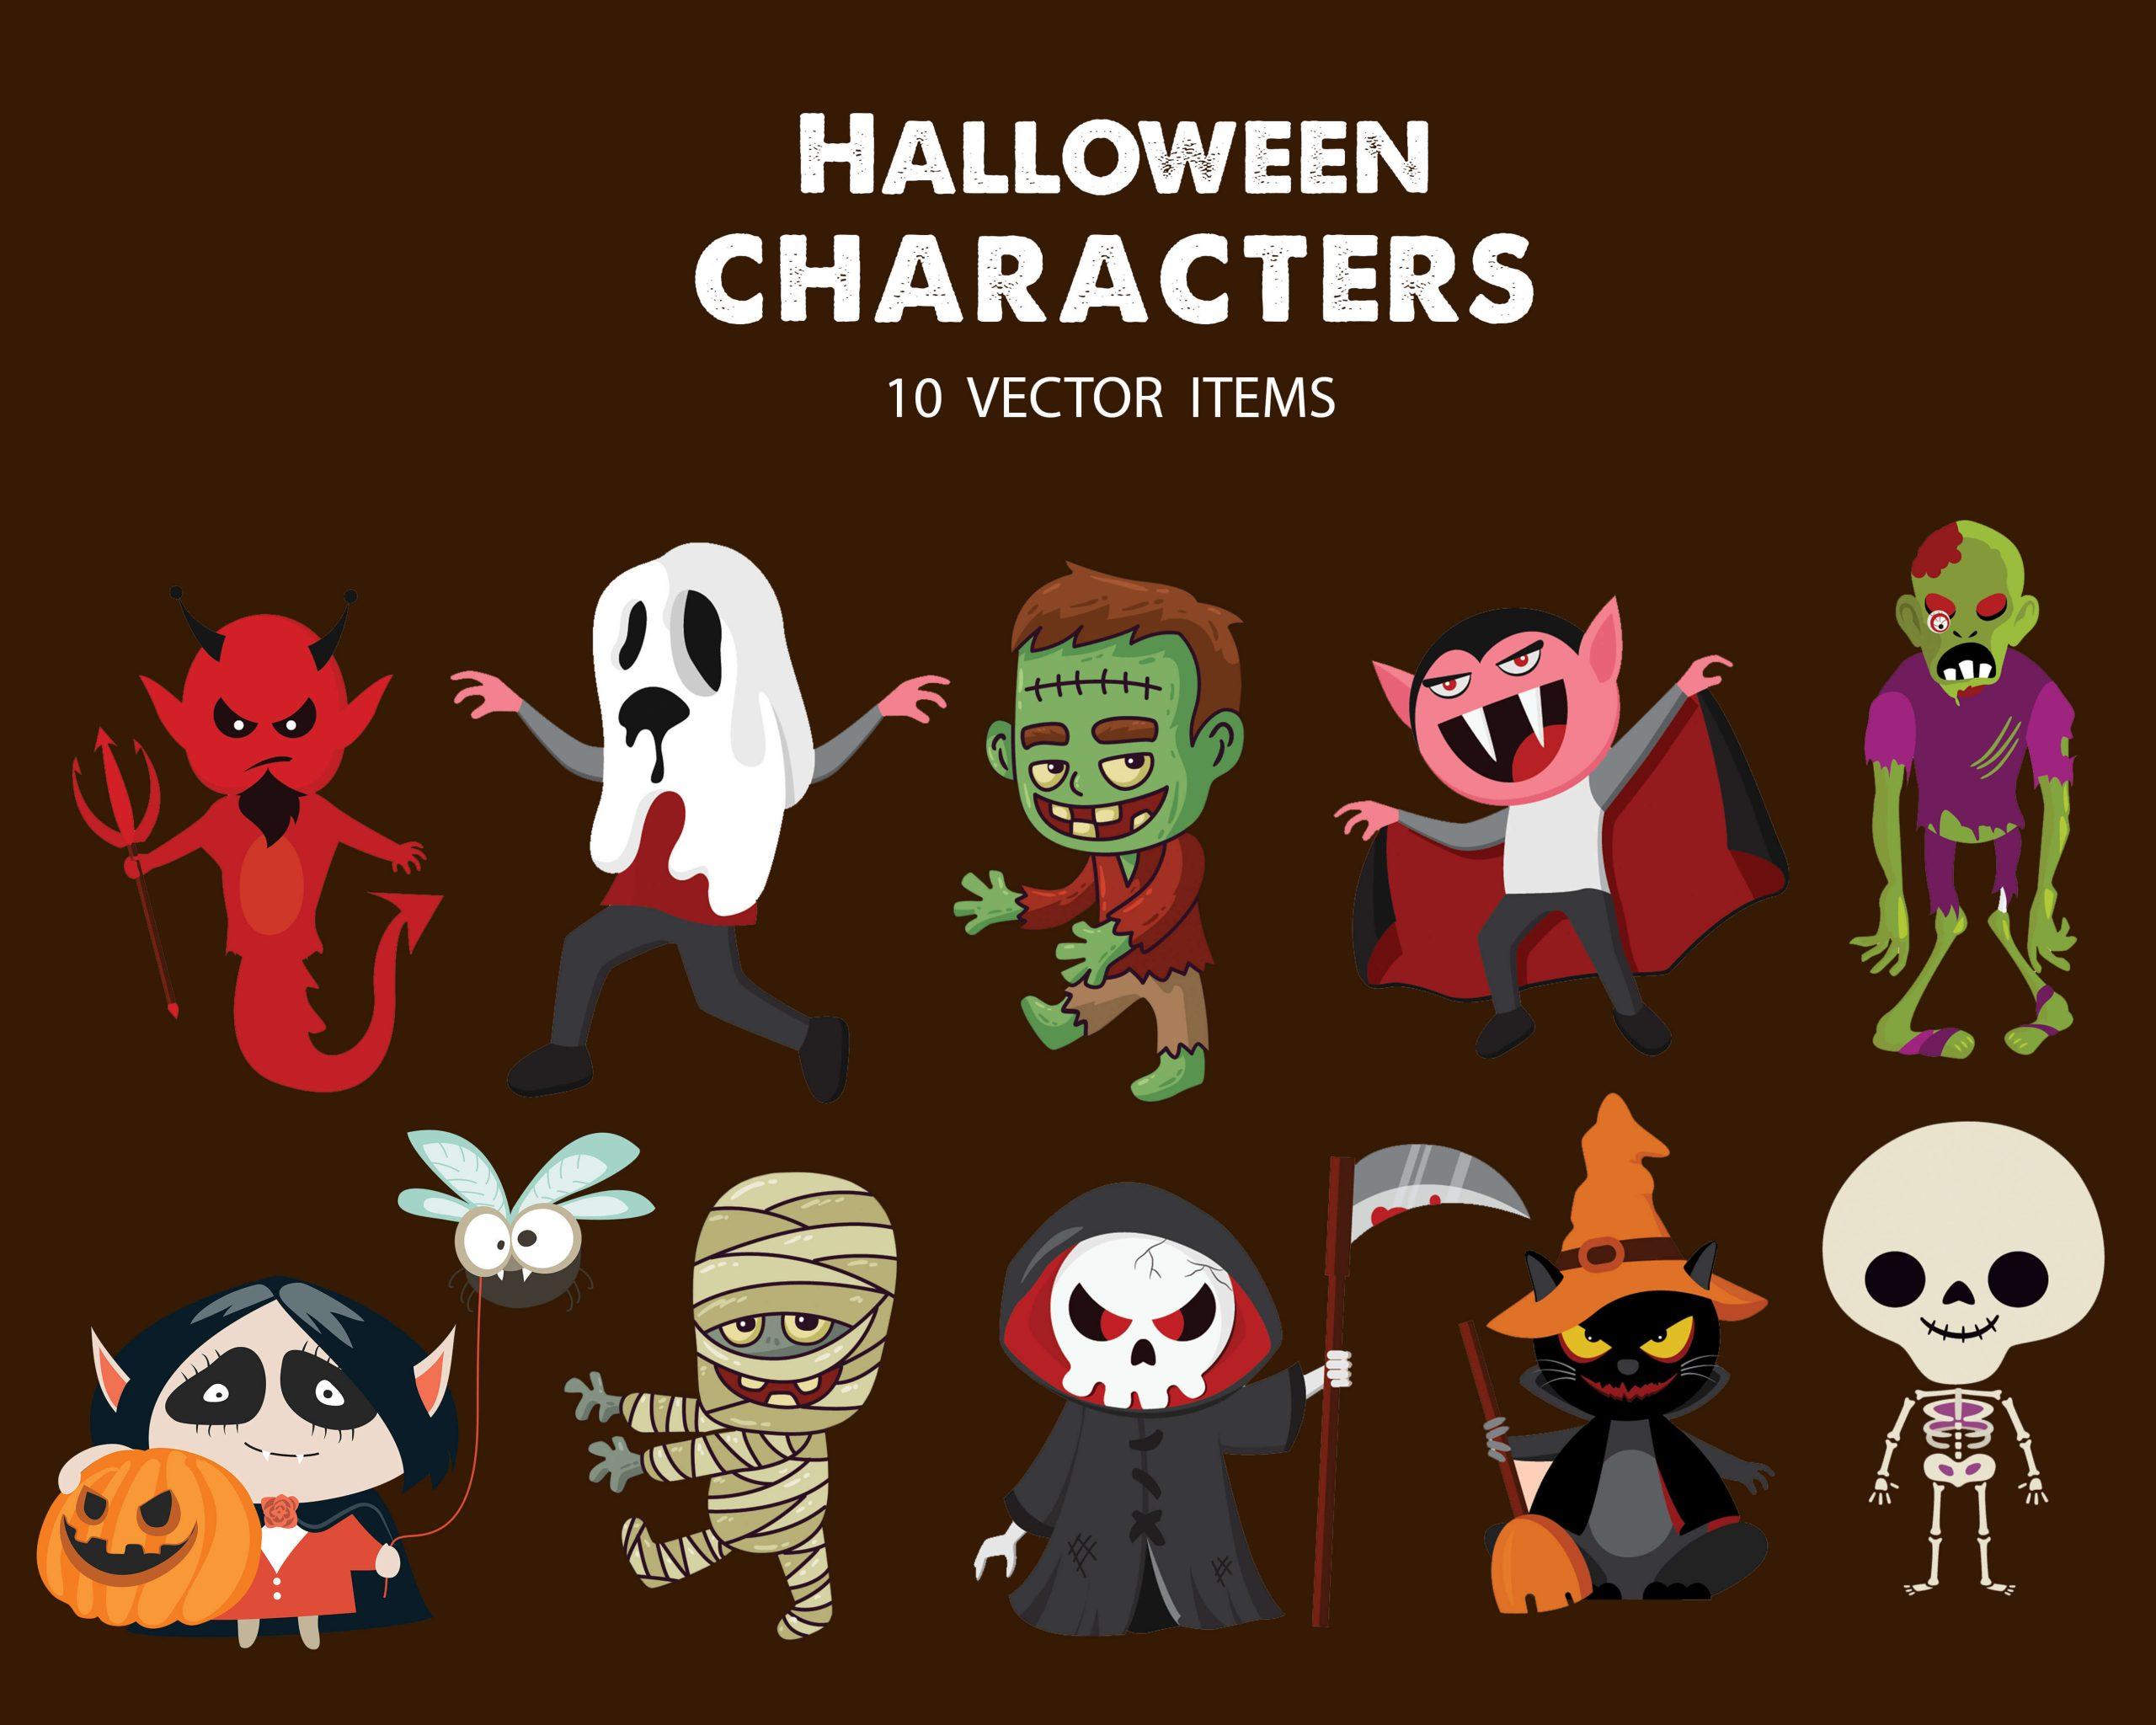 Spooky Vector Images - 10 Halloween Characters